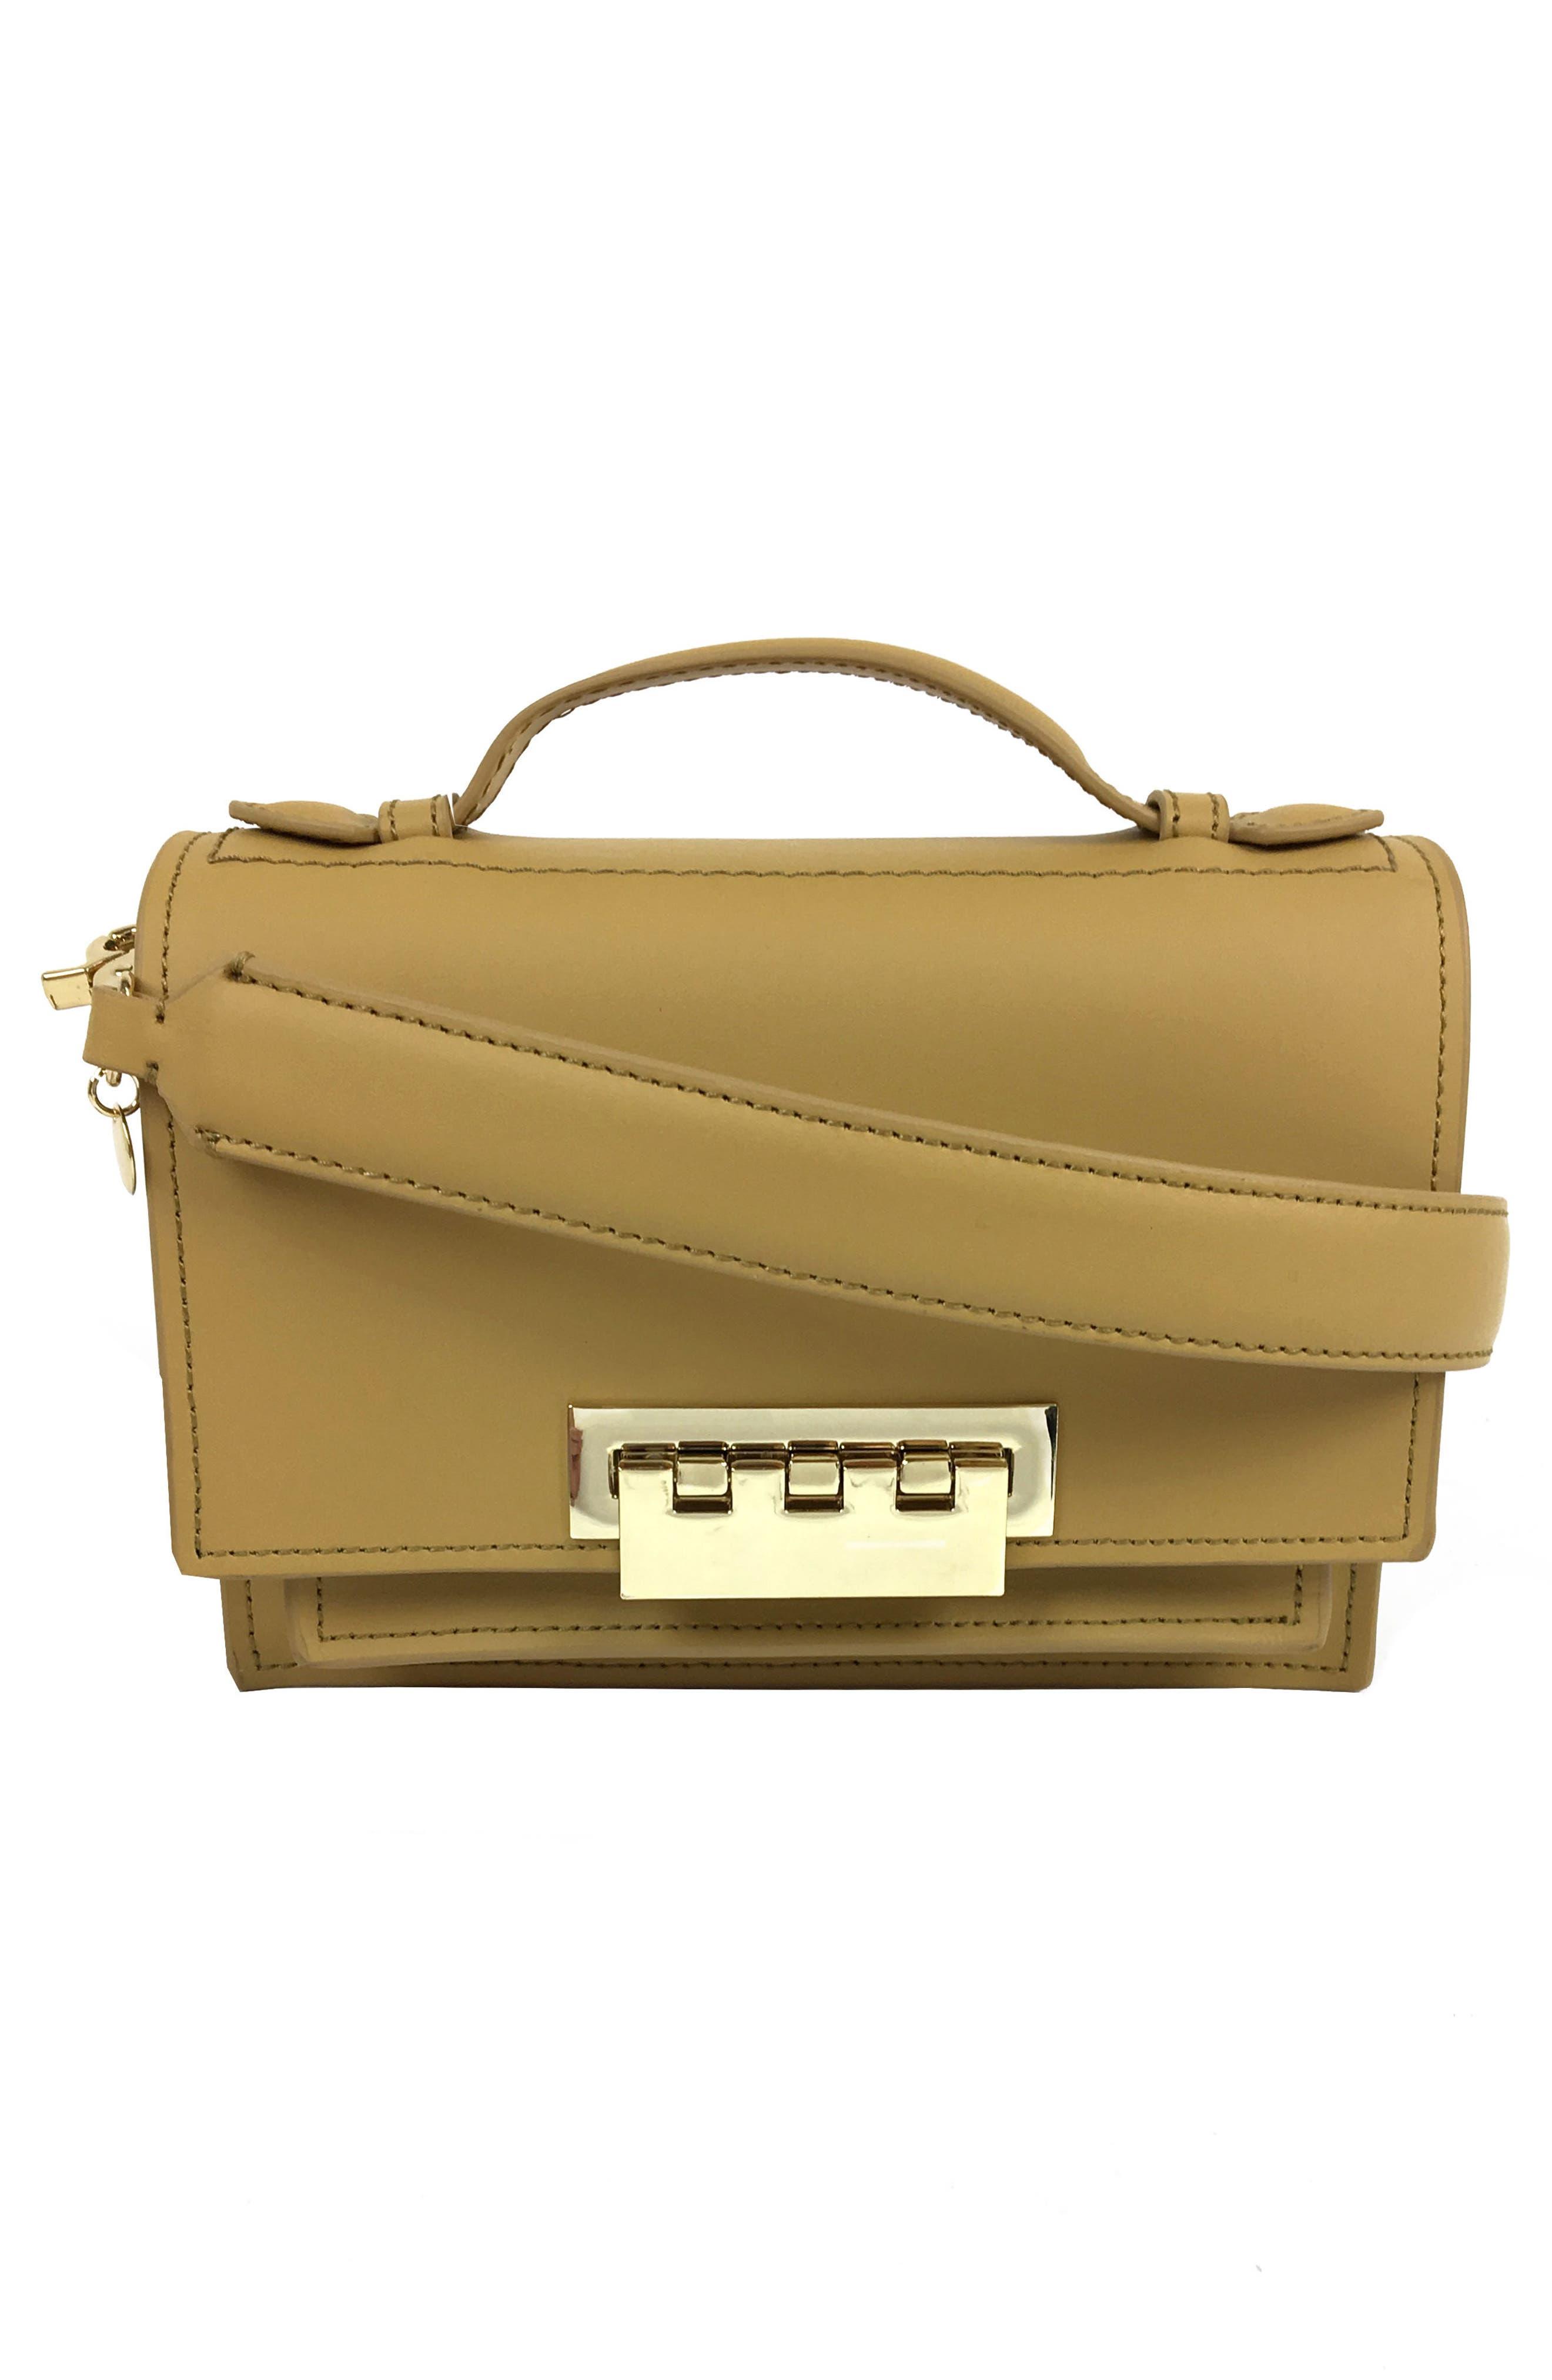 Main Image - ZAC Zac Posen Earthette Leather Accordion Bag